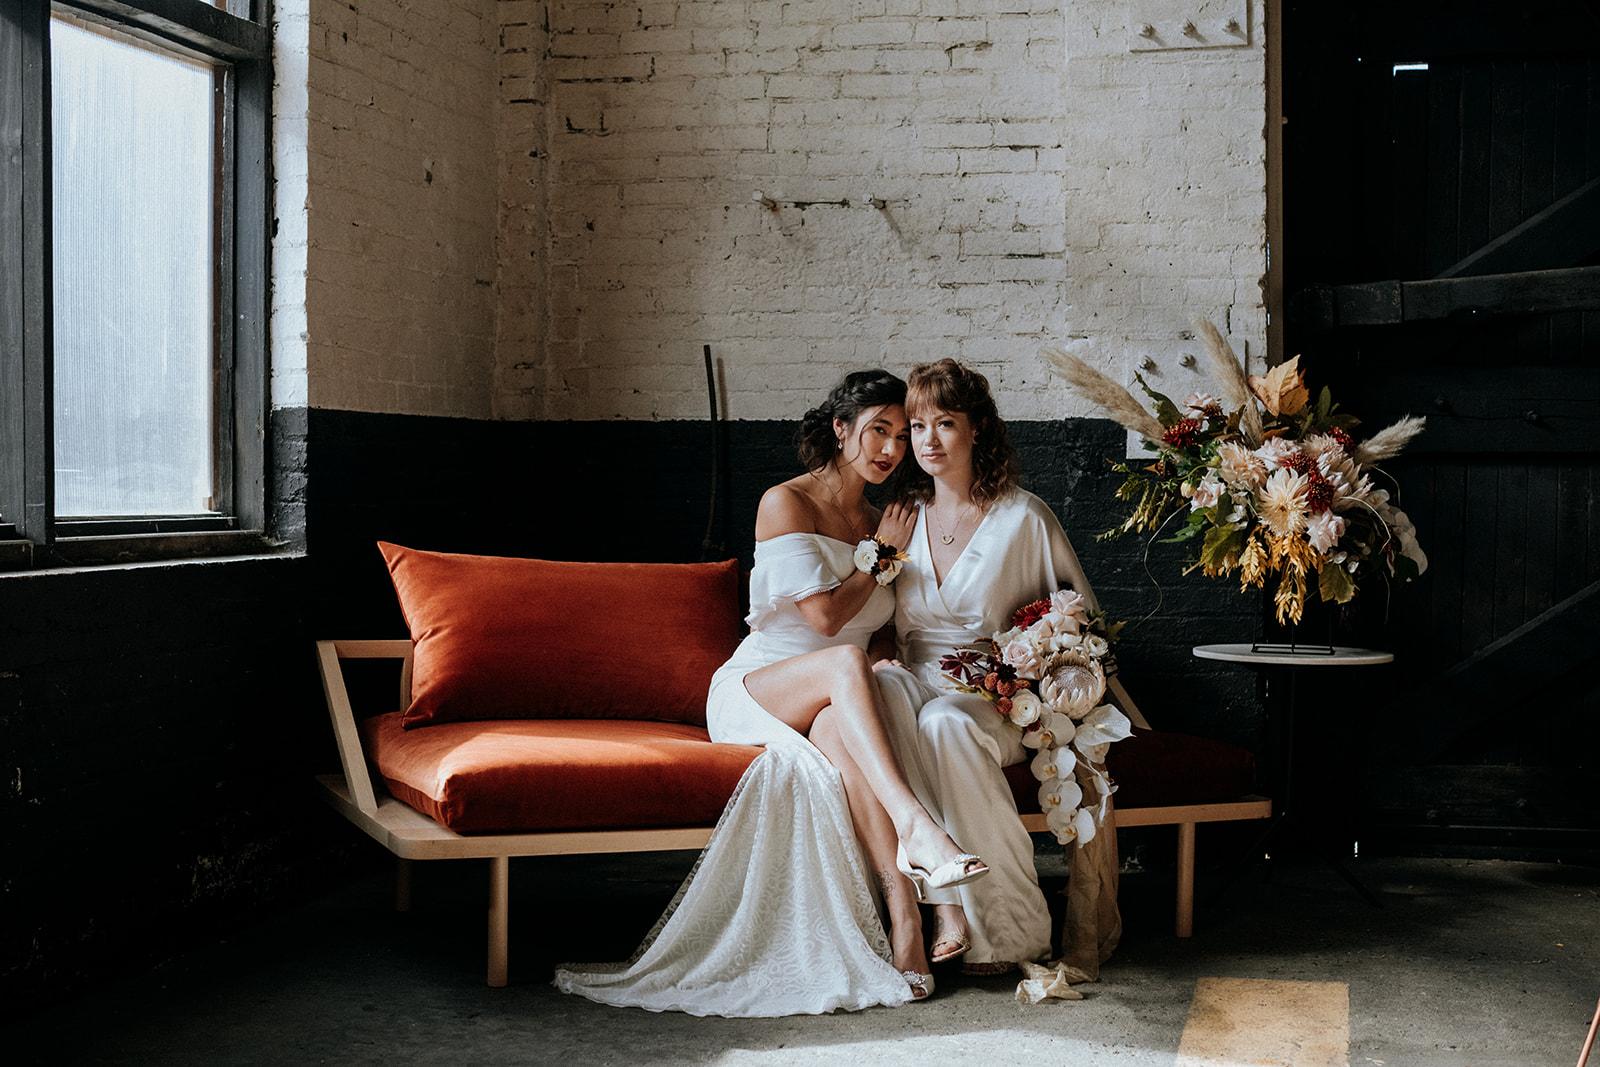 Roundhouse_-_Industrial_Wedding_-_Kim_Jay_Photo-104.jpg